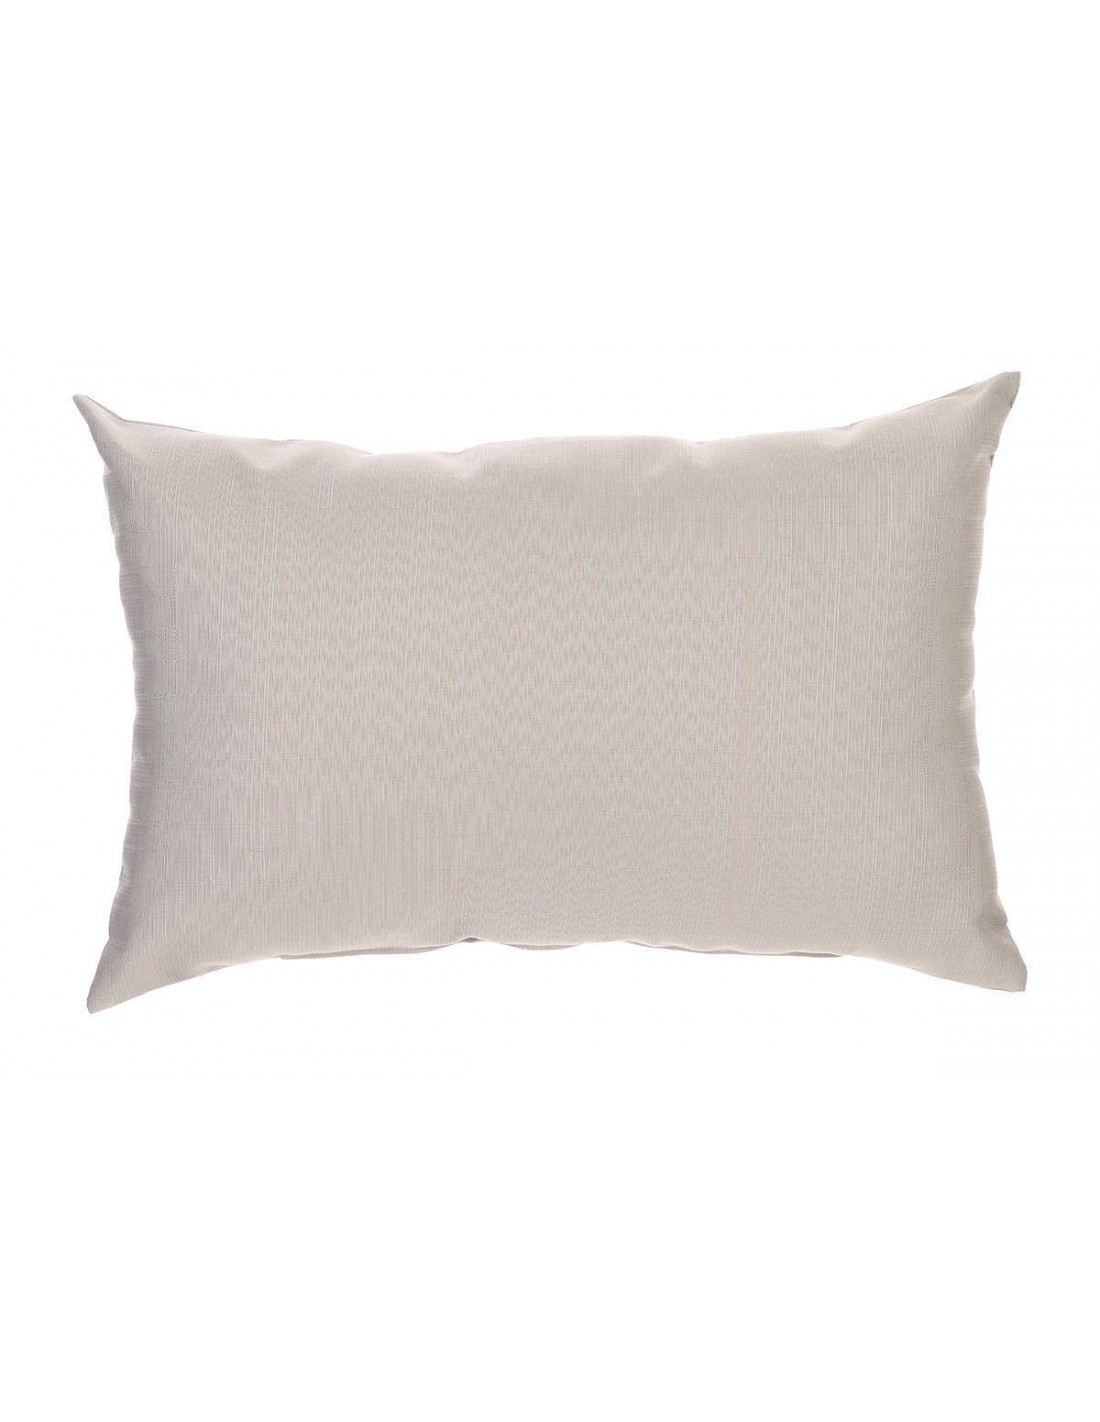 coussin d co 40x60 cm d houssable en polyester hesperide. Black Bedroom Furniture Sets. Home Design Ideas